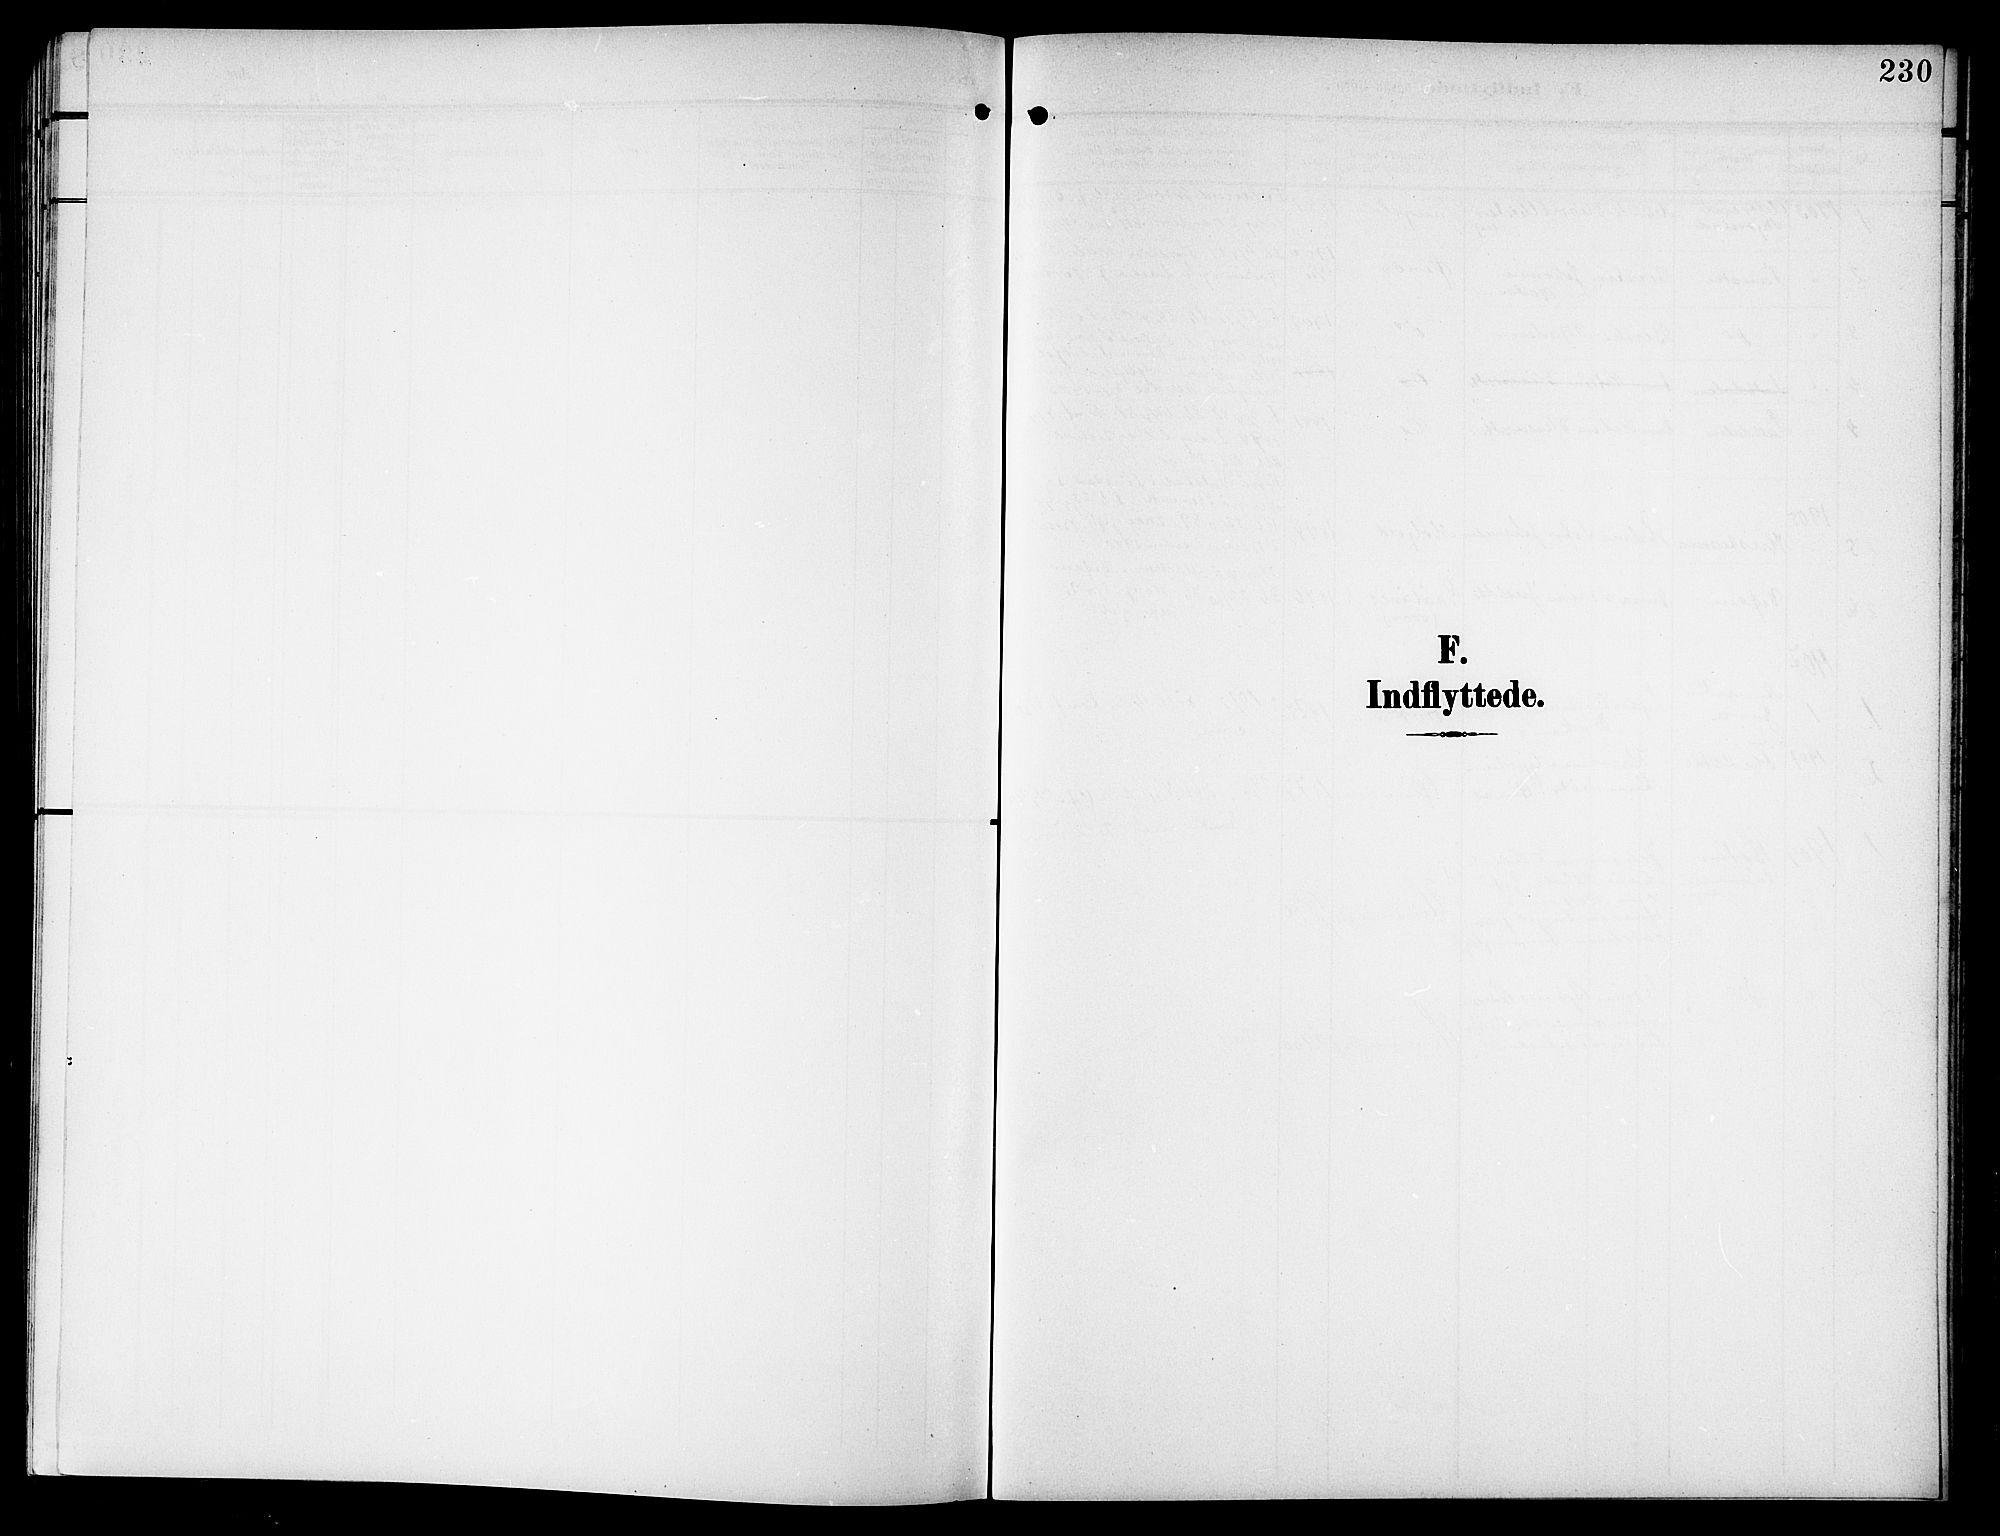 SAT, Ministerialprotokoller, klokkerbøker og fødselsregistre - Nordland, 846/L0647: Klokkerbok nr. 846C05, 1902-1916, s. 230